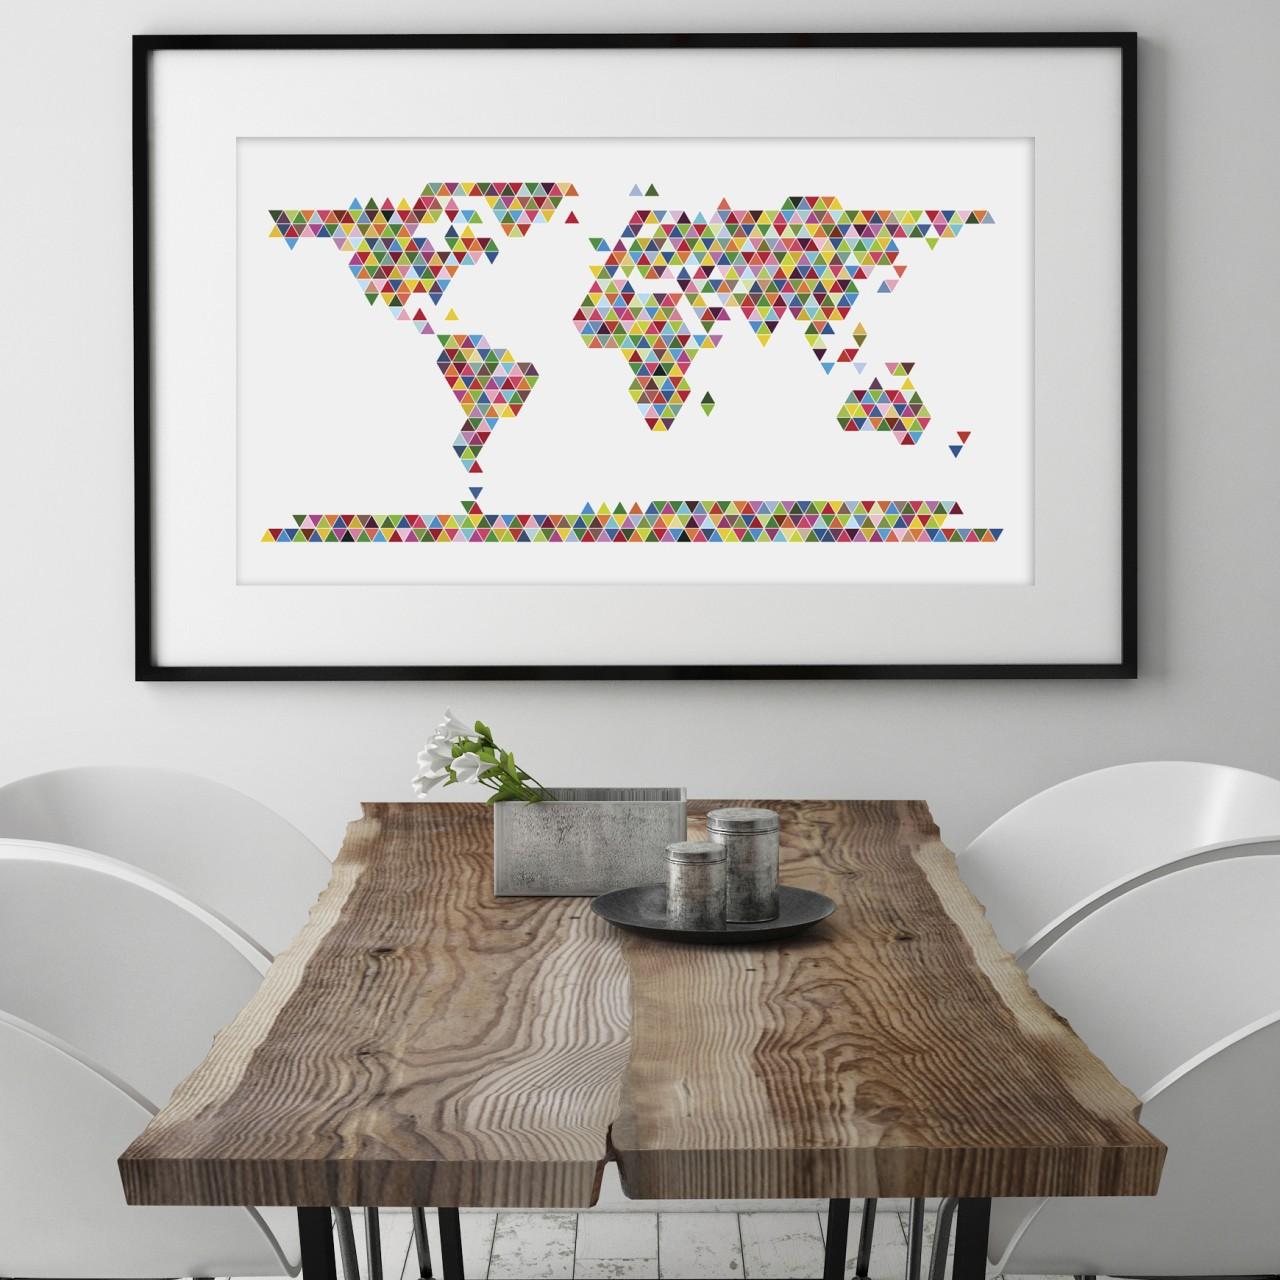 wall sticker world map xl world map triangle